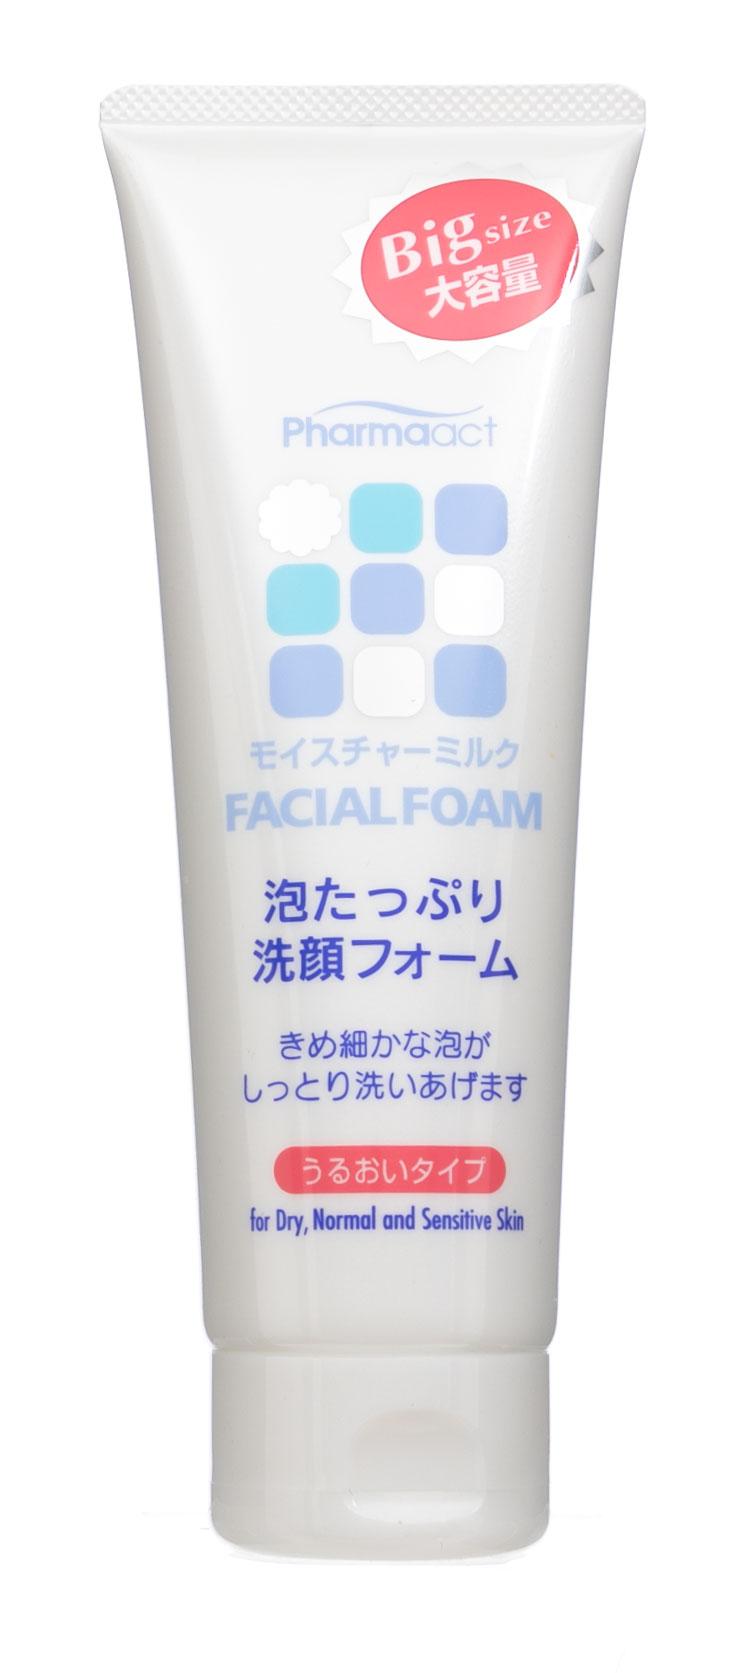 Купить Kumano cosmetics Пенка д/умывания с увлаж молочком Pharmaact 160мл (Kumano cosmetics, Косметика для умывания), Япония